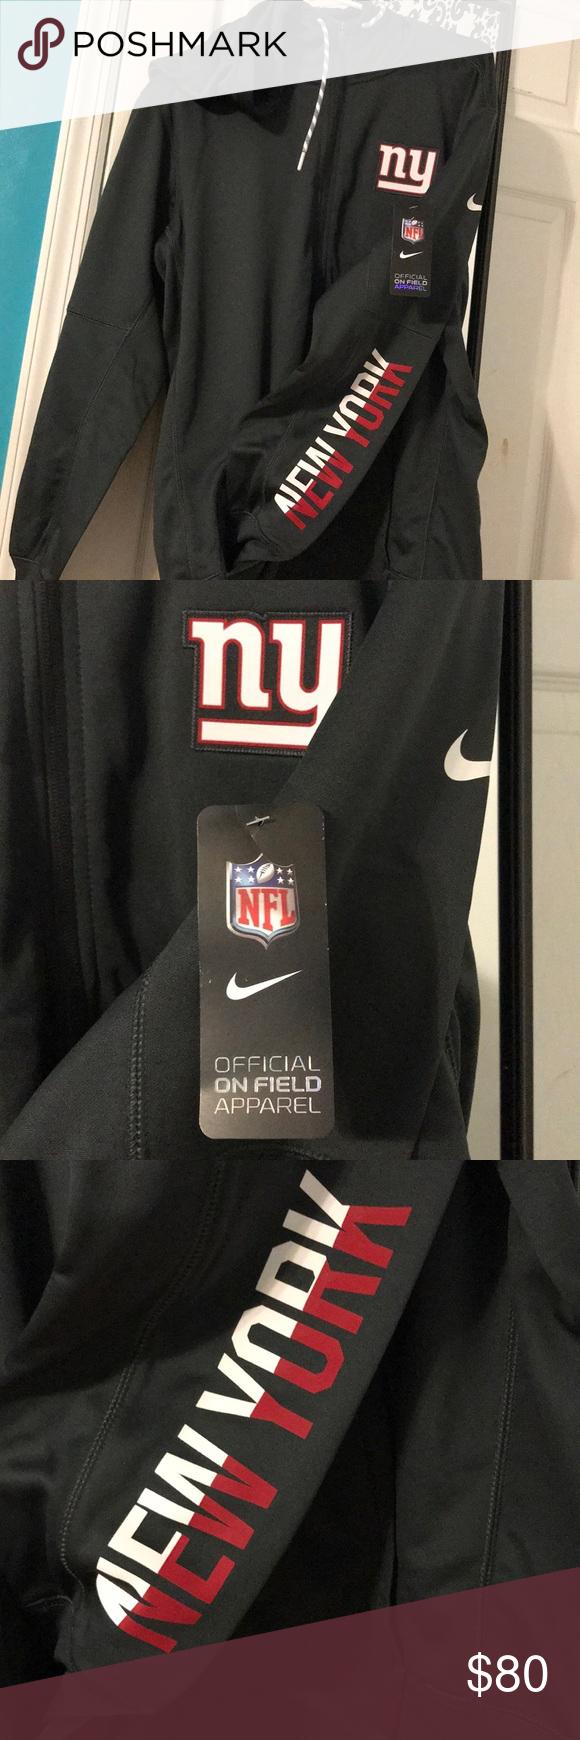 timeless design 73881 7144c NIKE New York Giants full zip sweatshirt NWT NFL NY giants ...